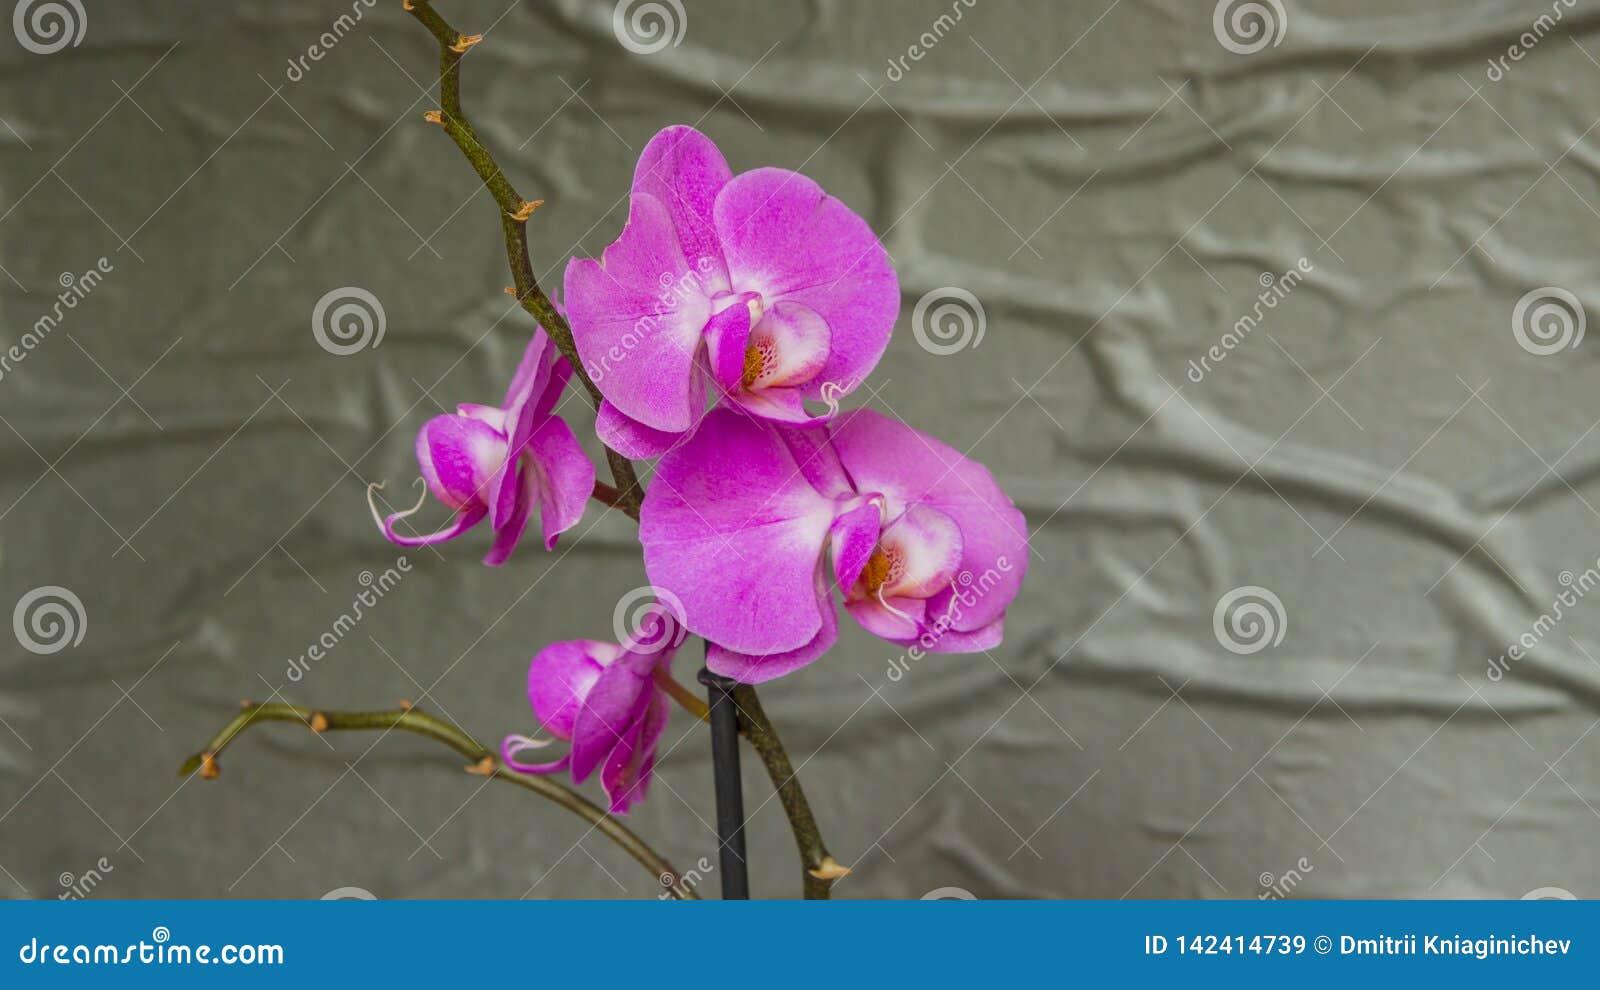 Purple orchid flower phalaenopsis. Close-up